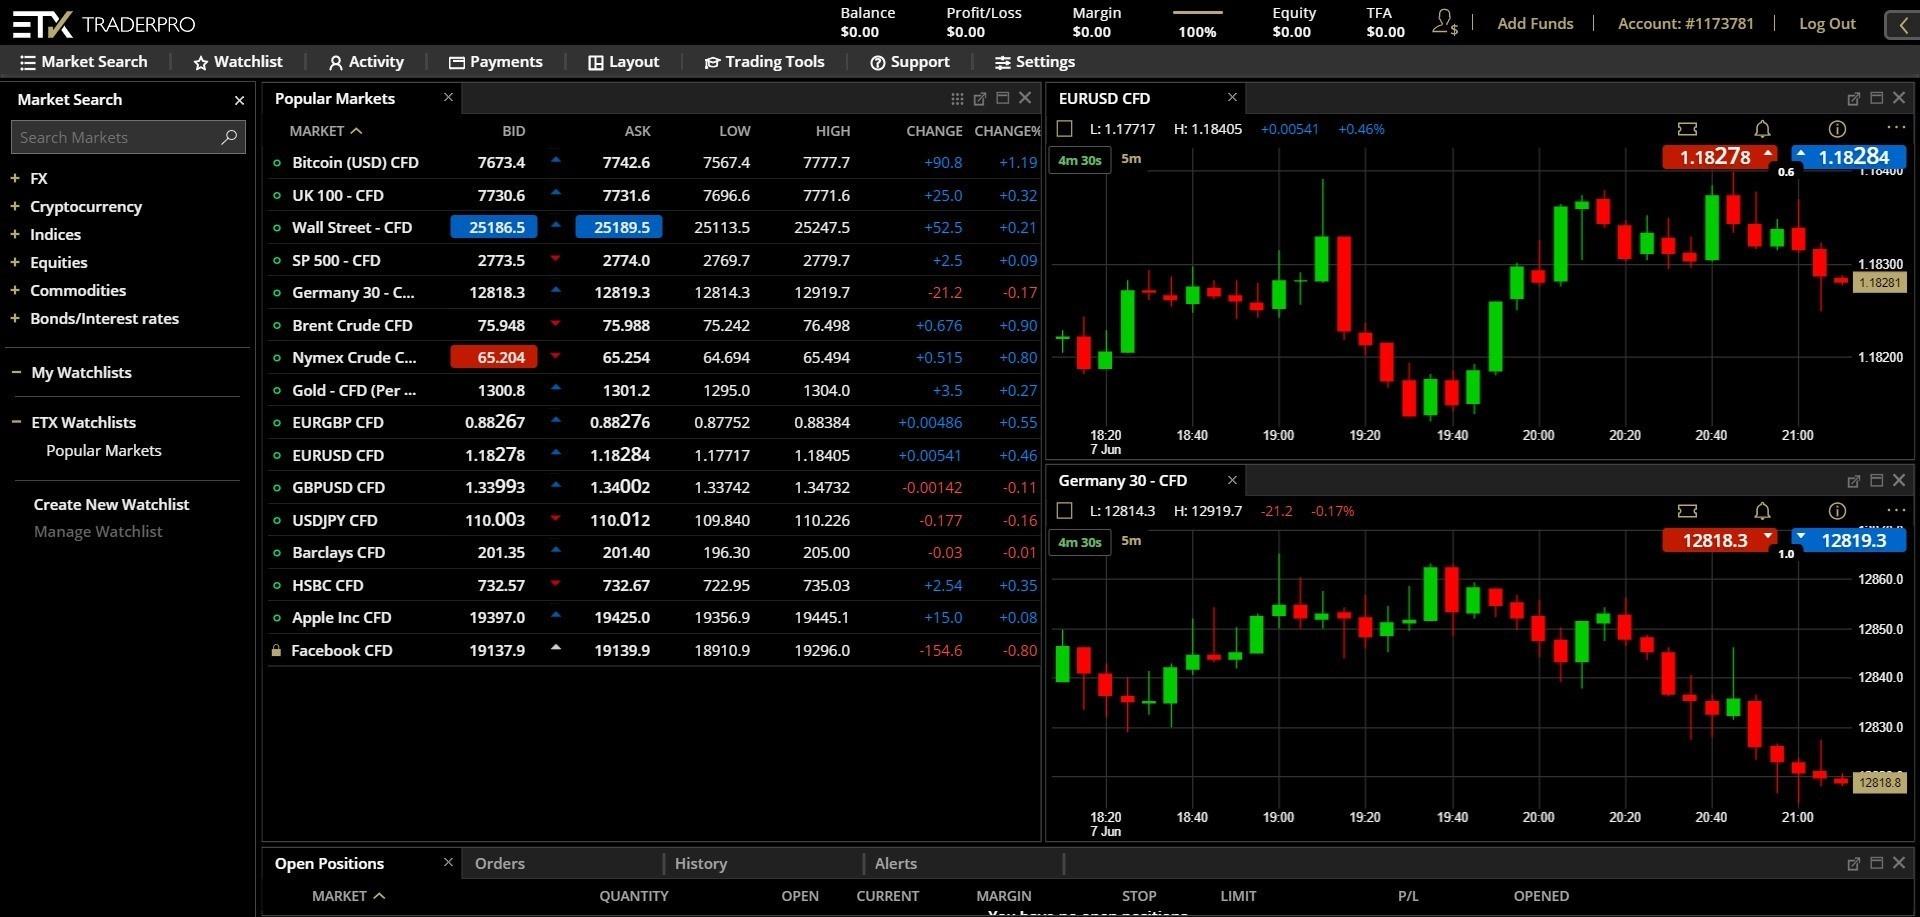 ETX TraderPro Platform